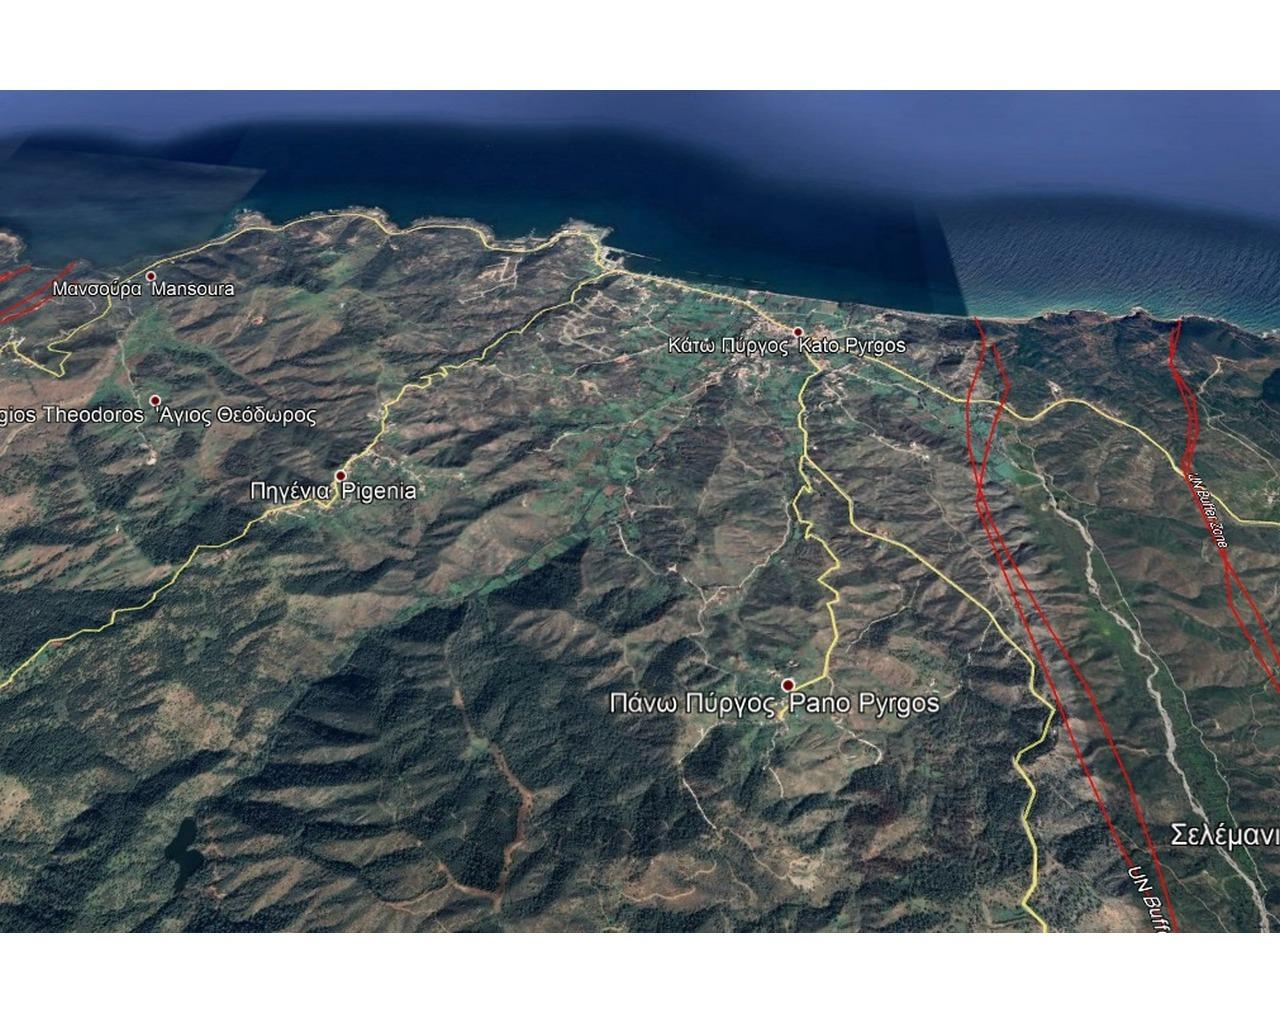 Land Nicosia(Pyrgos Pano)  836 SqMt for sale